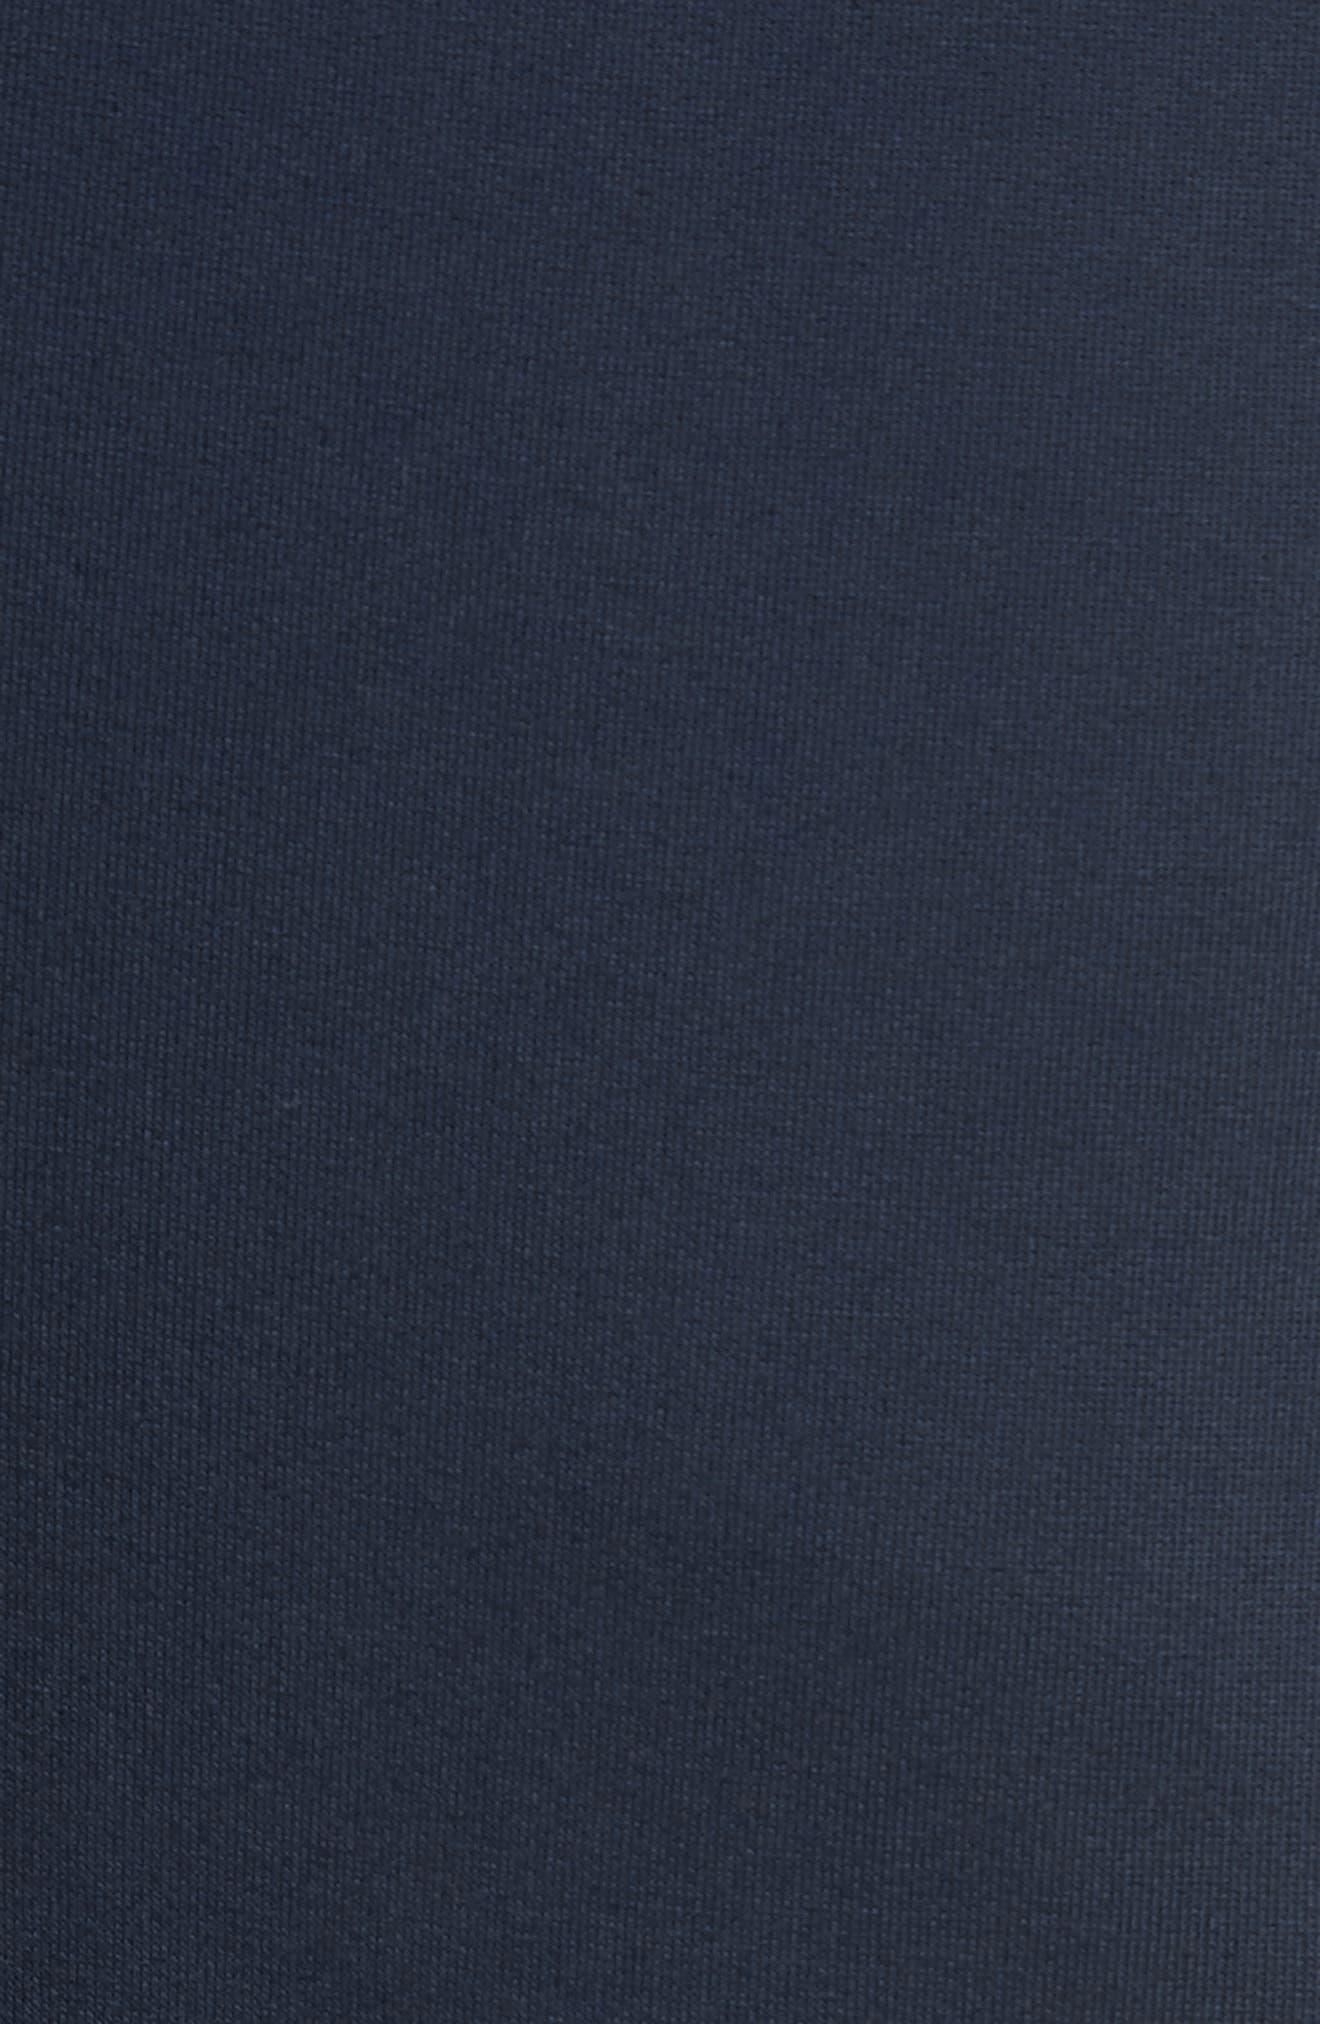 Modal Blend Lounge Pants,                             Alternate thumbnail 5, color,                             411